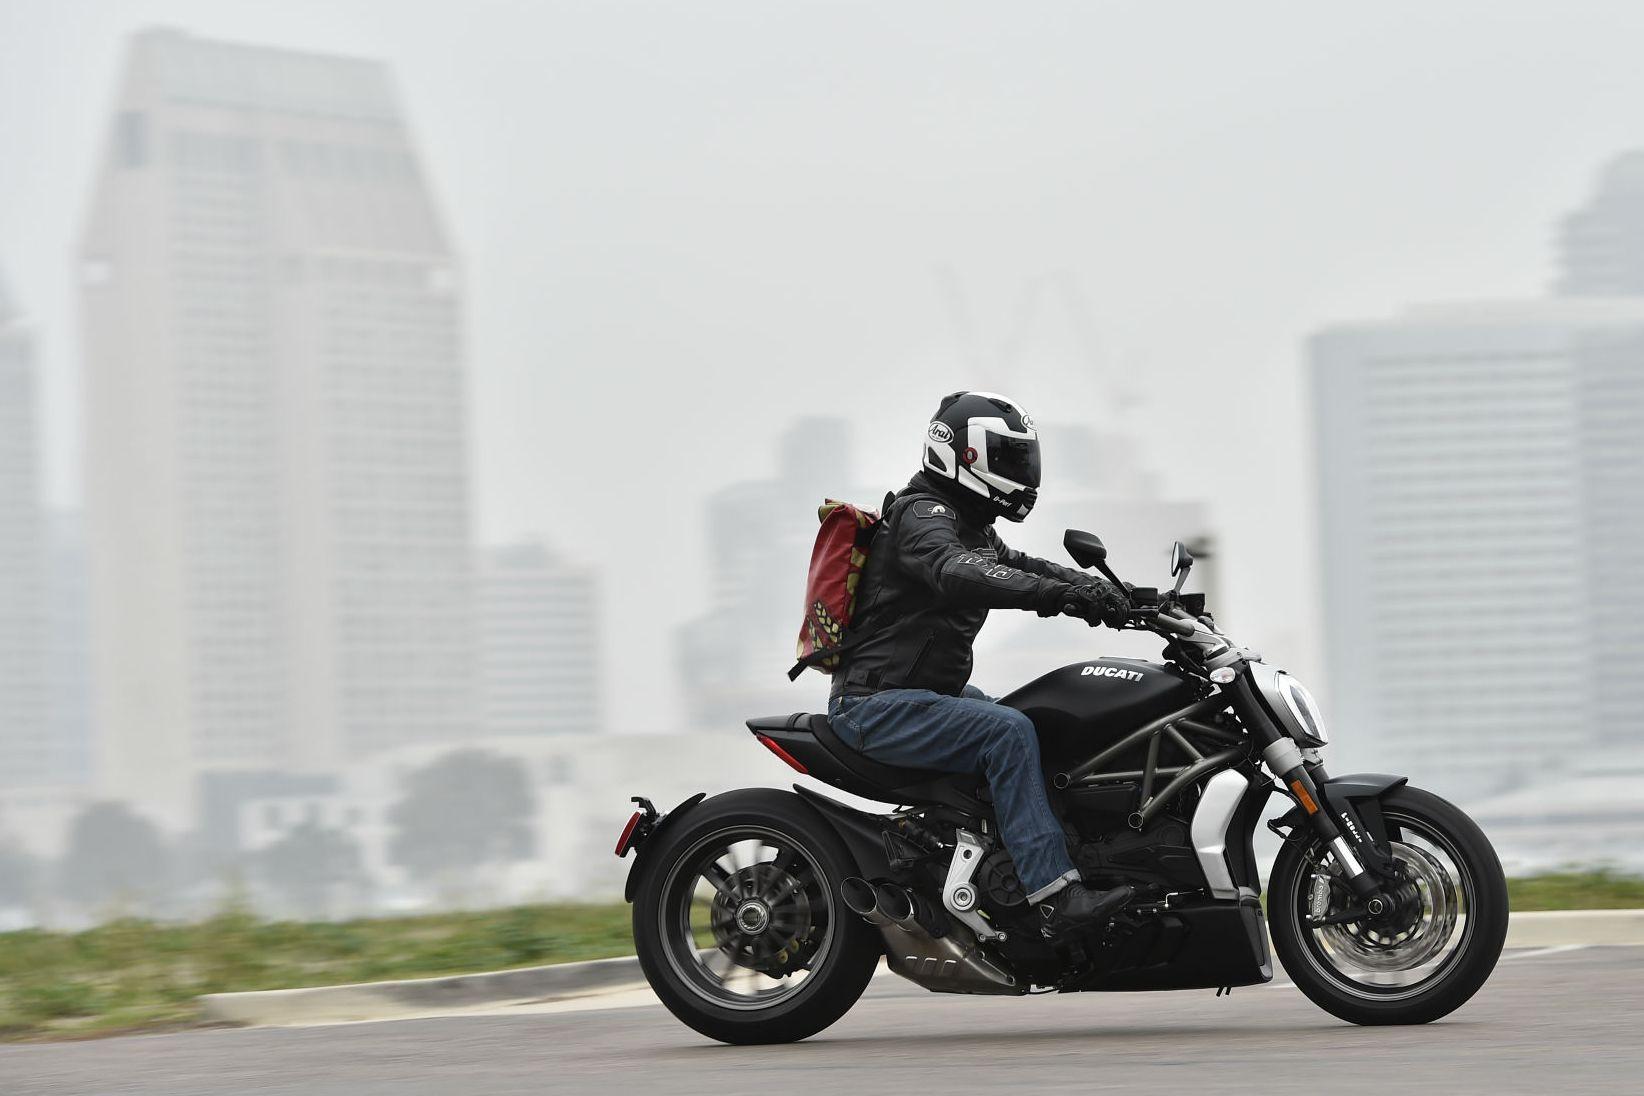 Urban riding